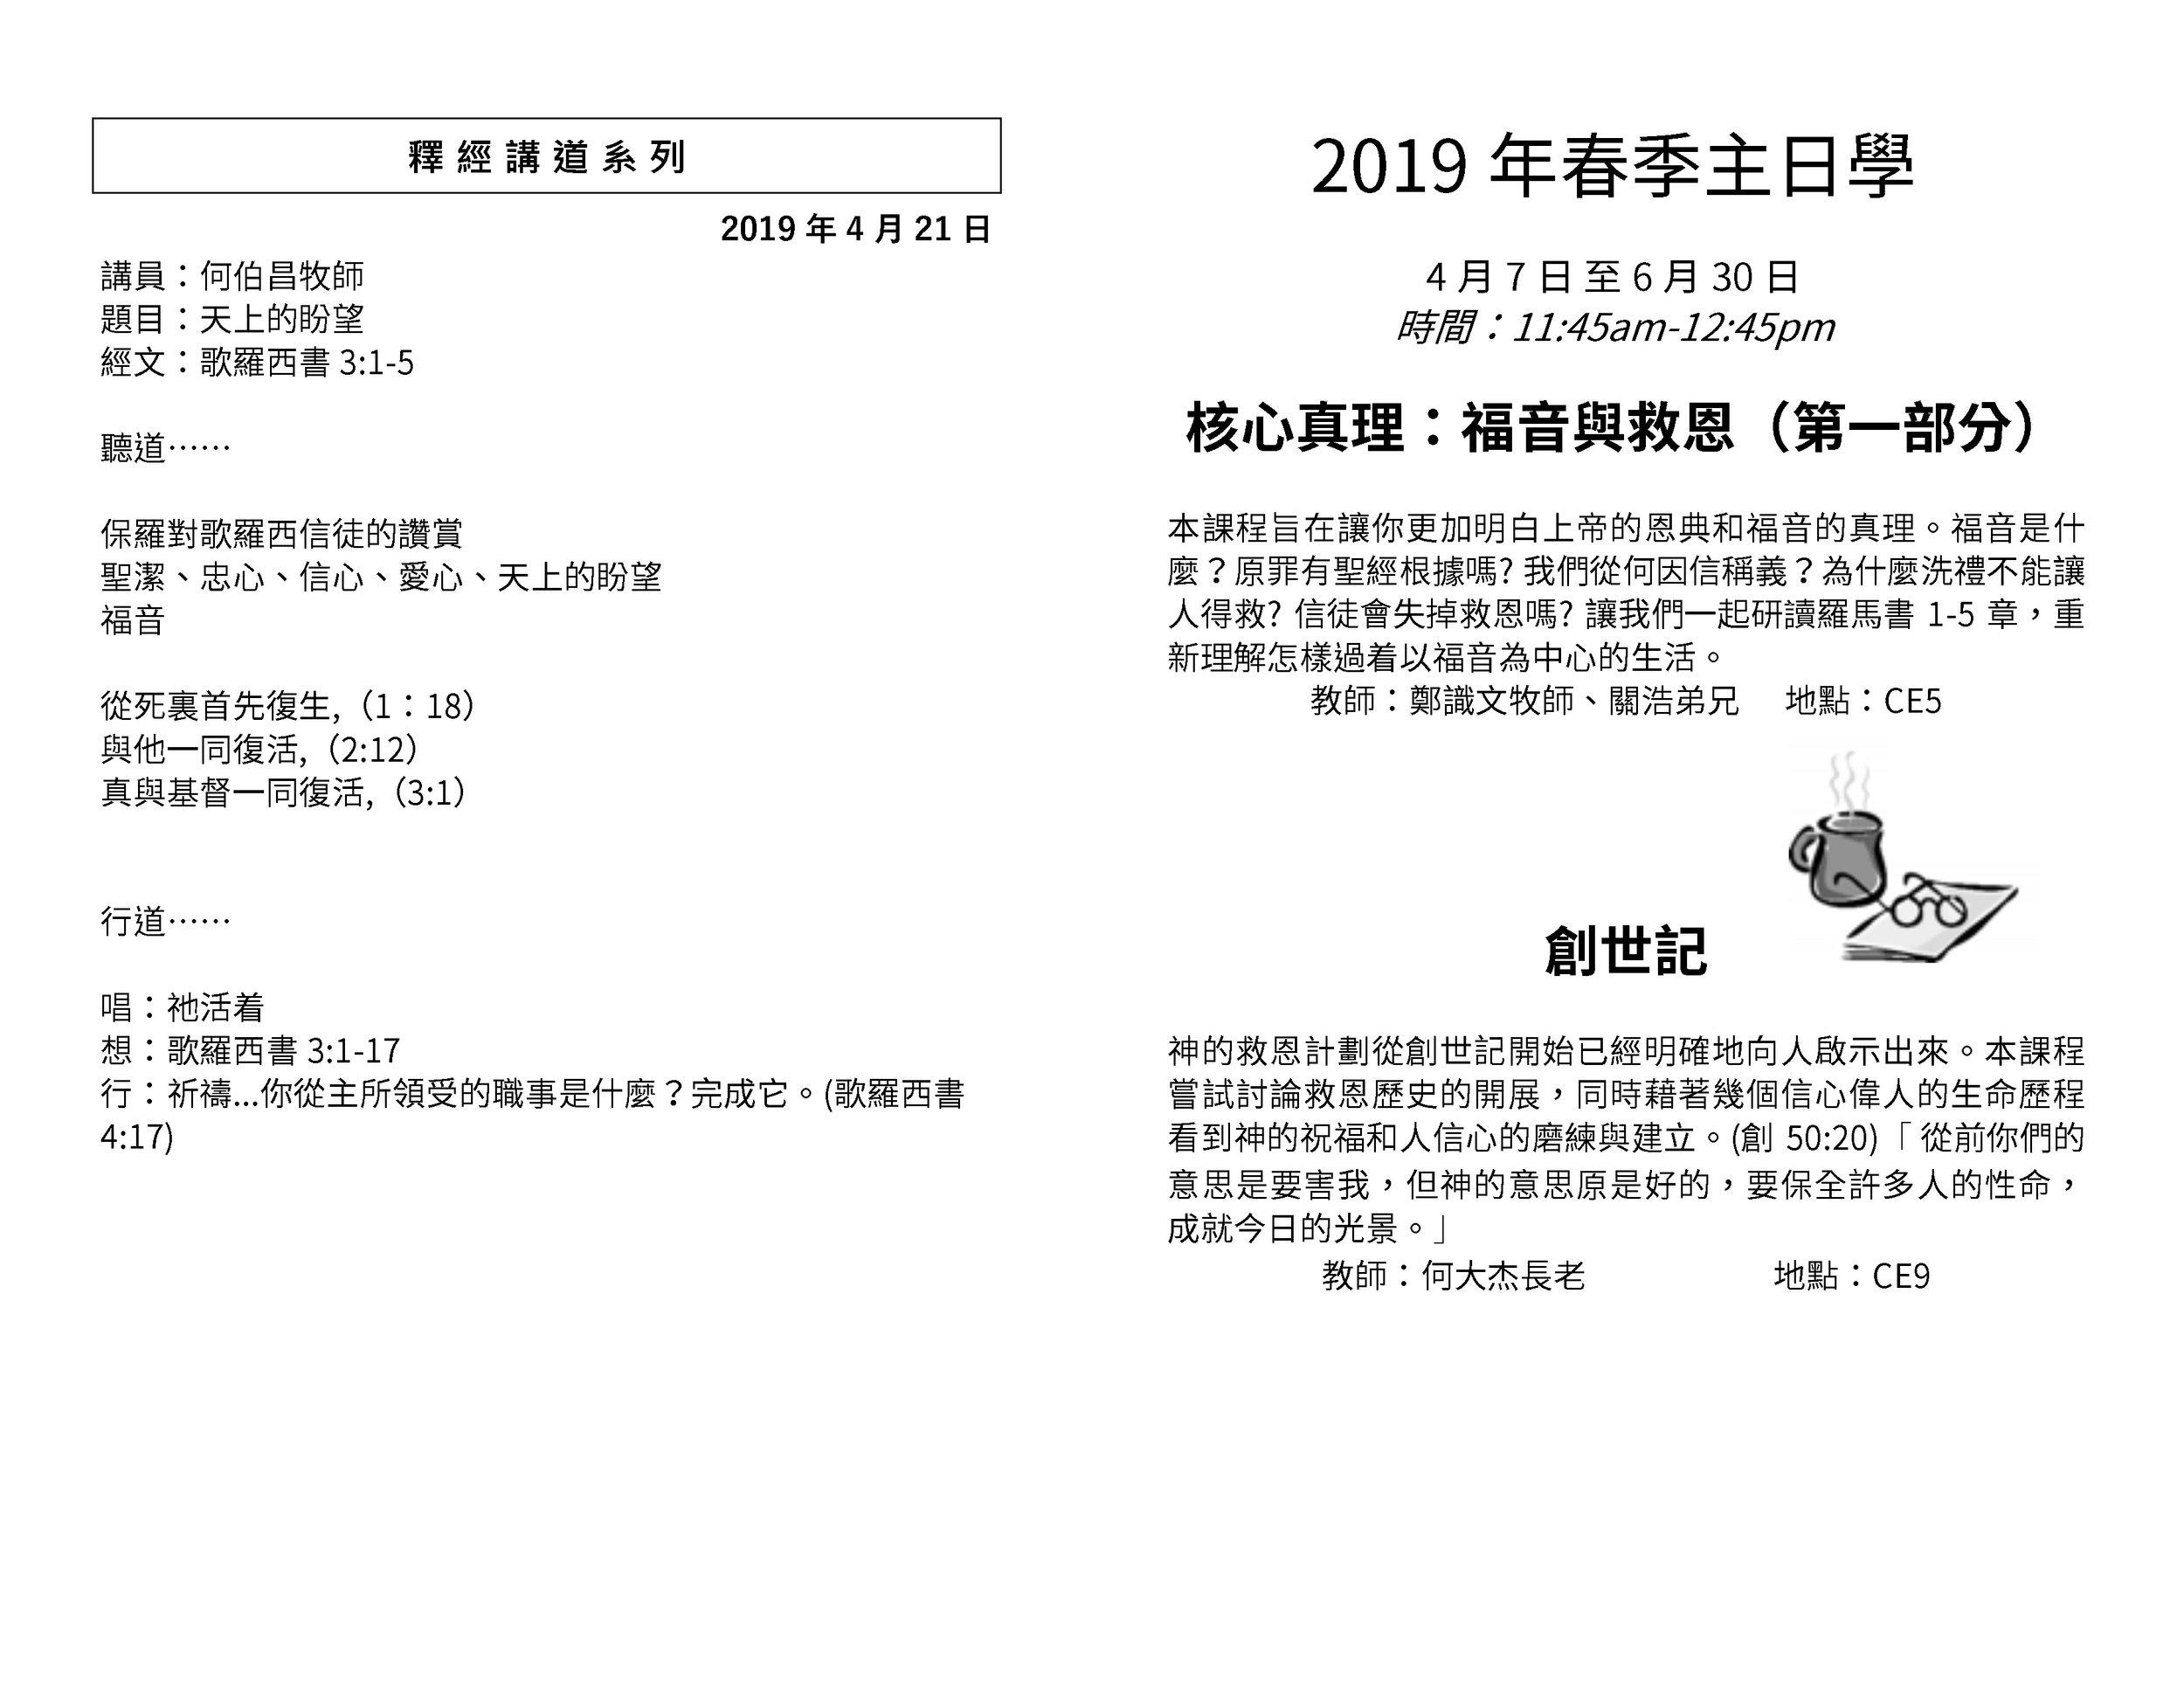 Chinese Bulletin 2019-4-21_Page_3.jpg